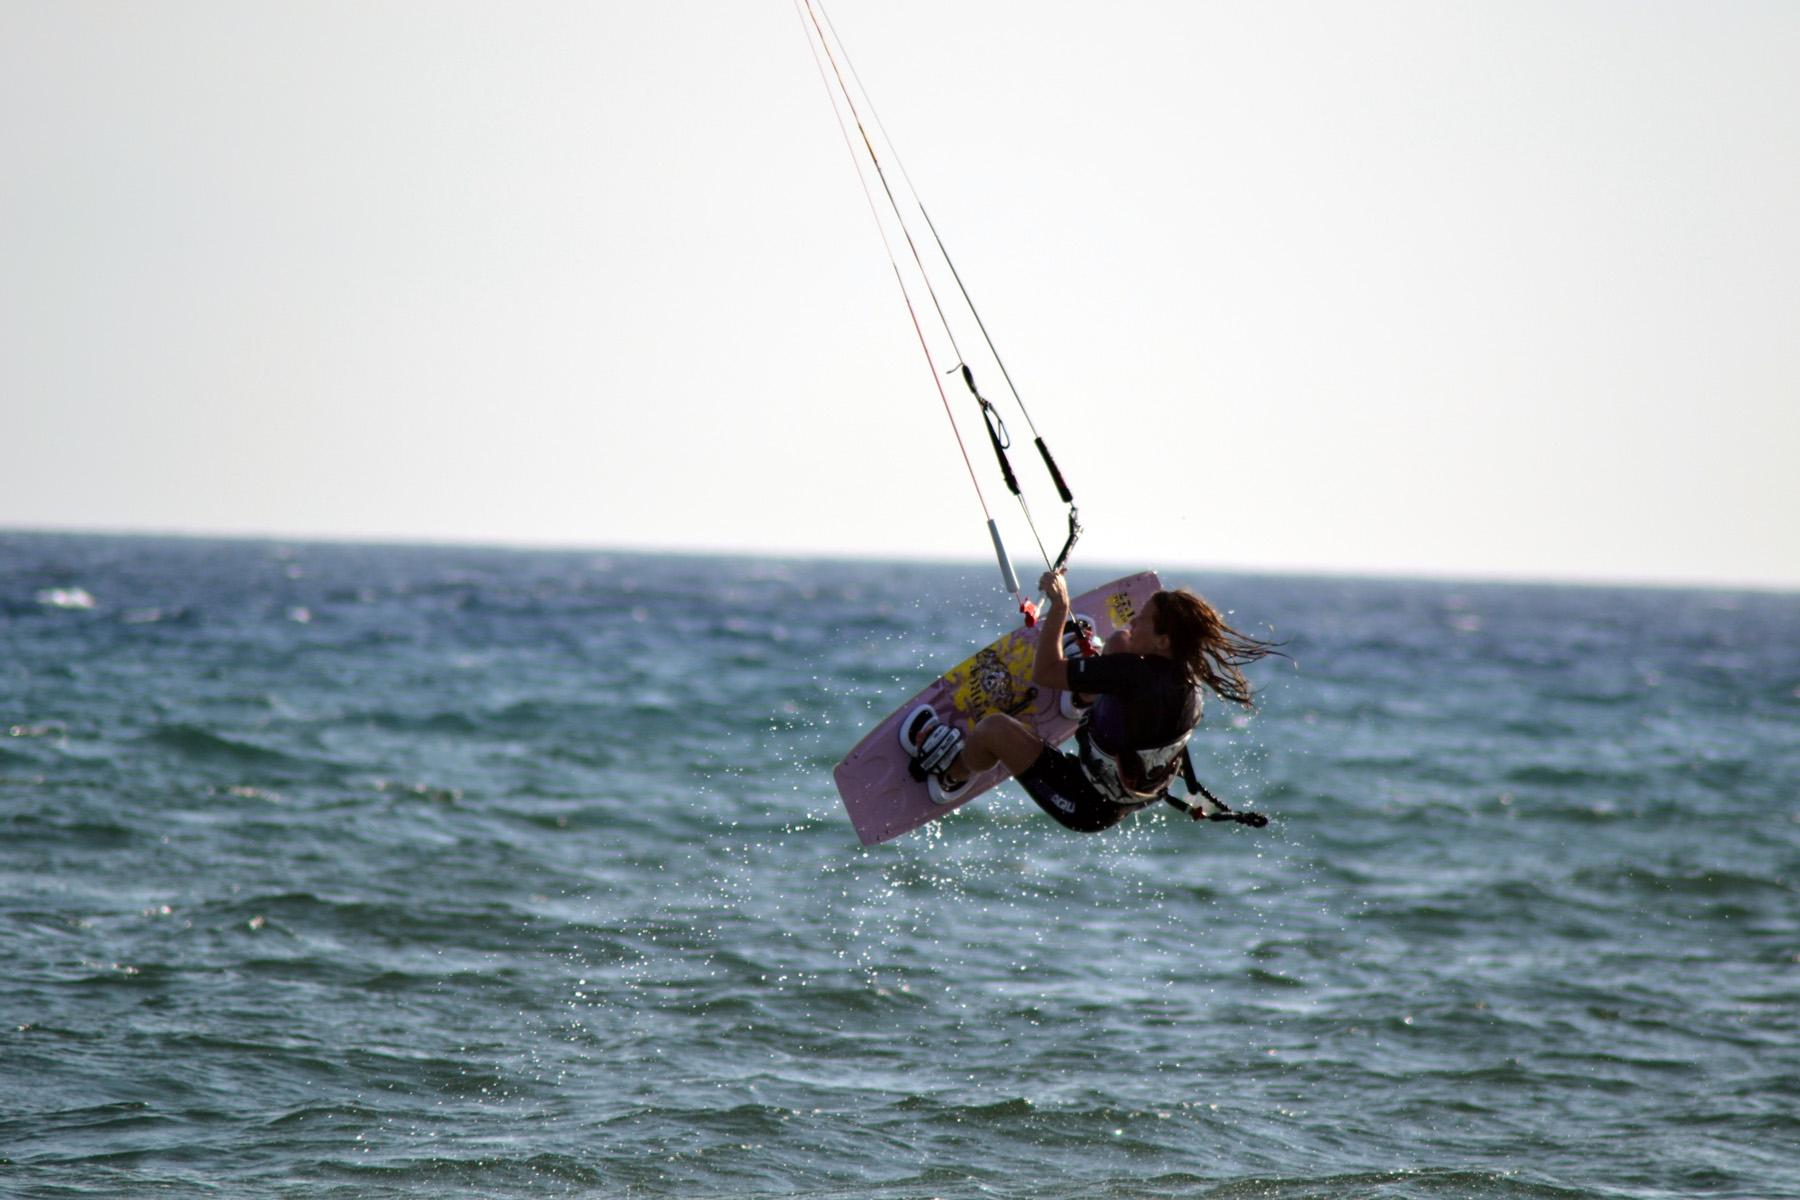 Soligt surf